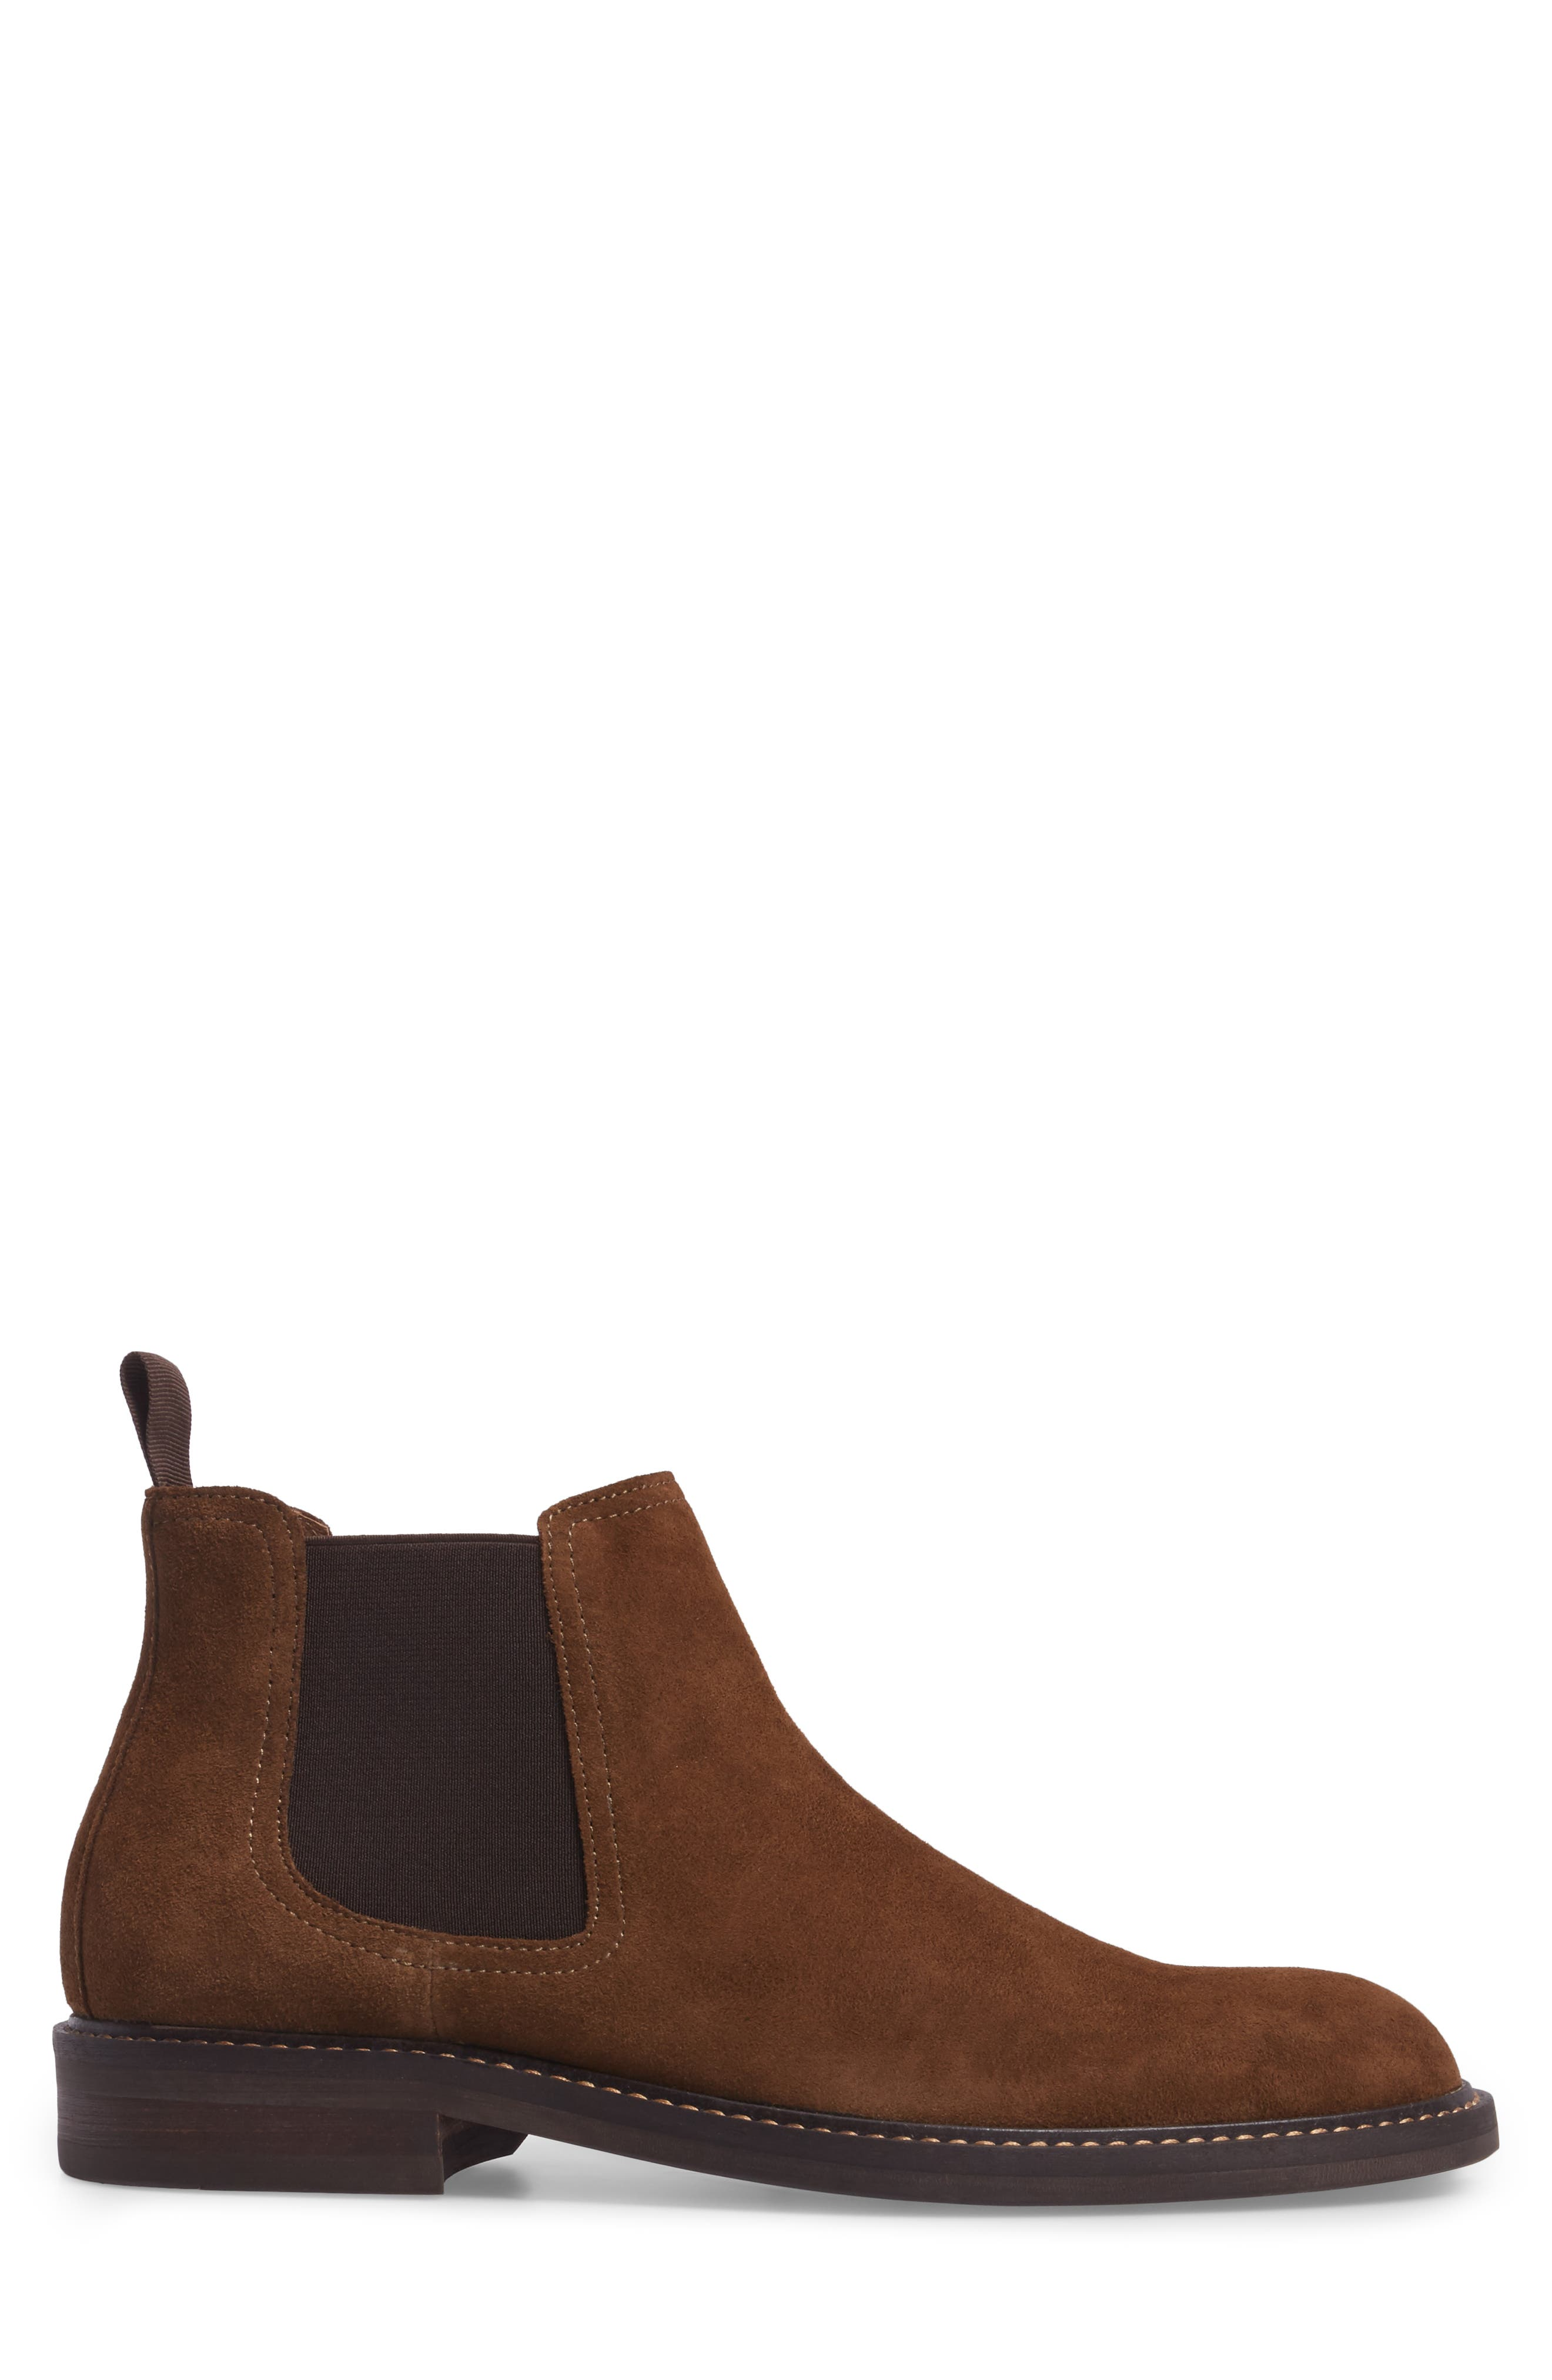 Horton Chelsea Boot,                             Alternate thumbnail 30, color,